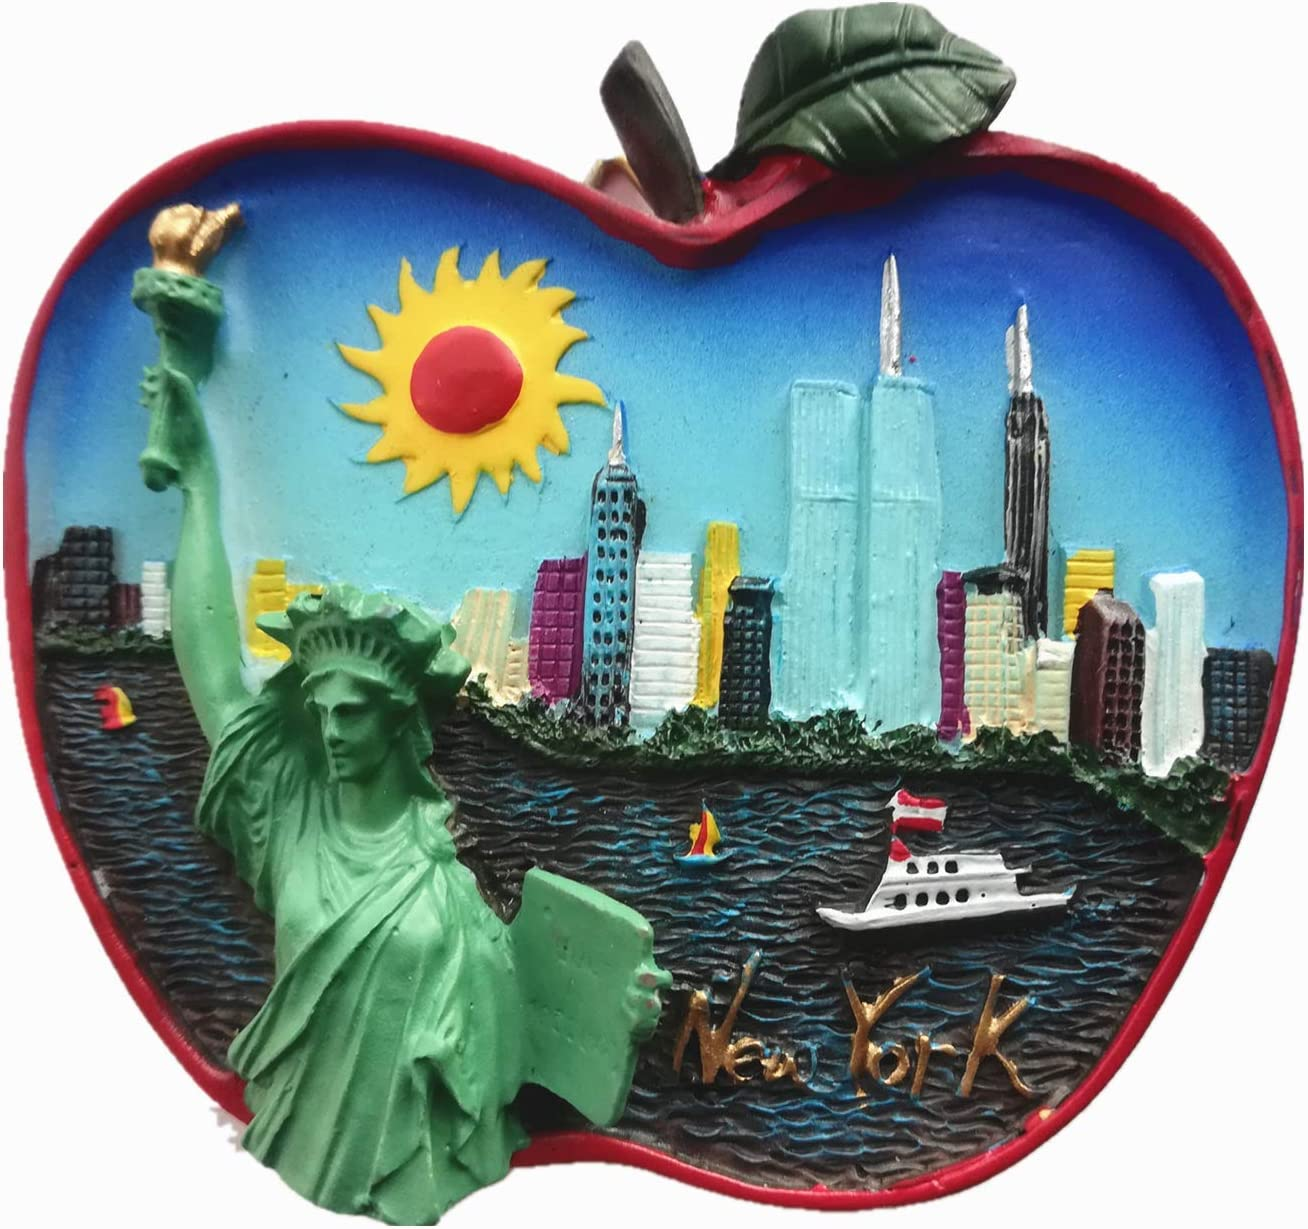 Apple Shape New York USA 3D Fridge Magnet,Home & Kitchen Decoration Magnetic Sticker New York USA Refrigerator Magnet